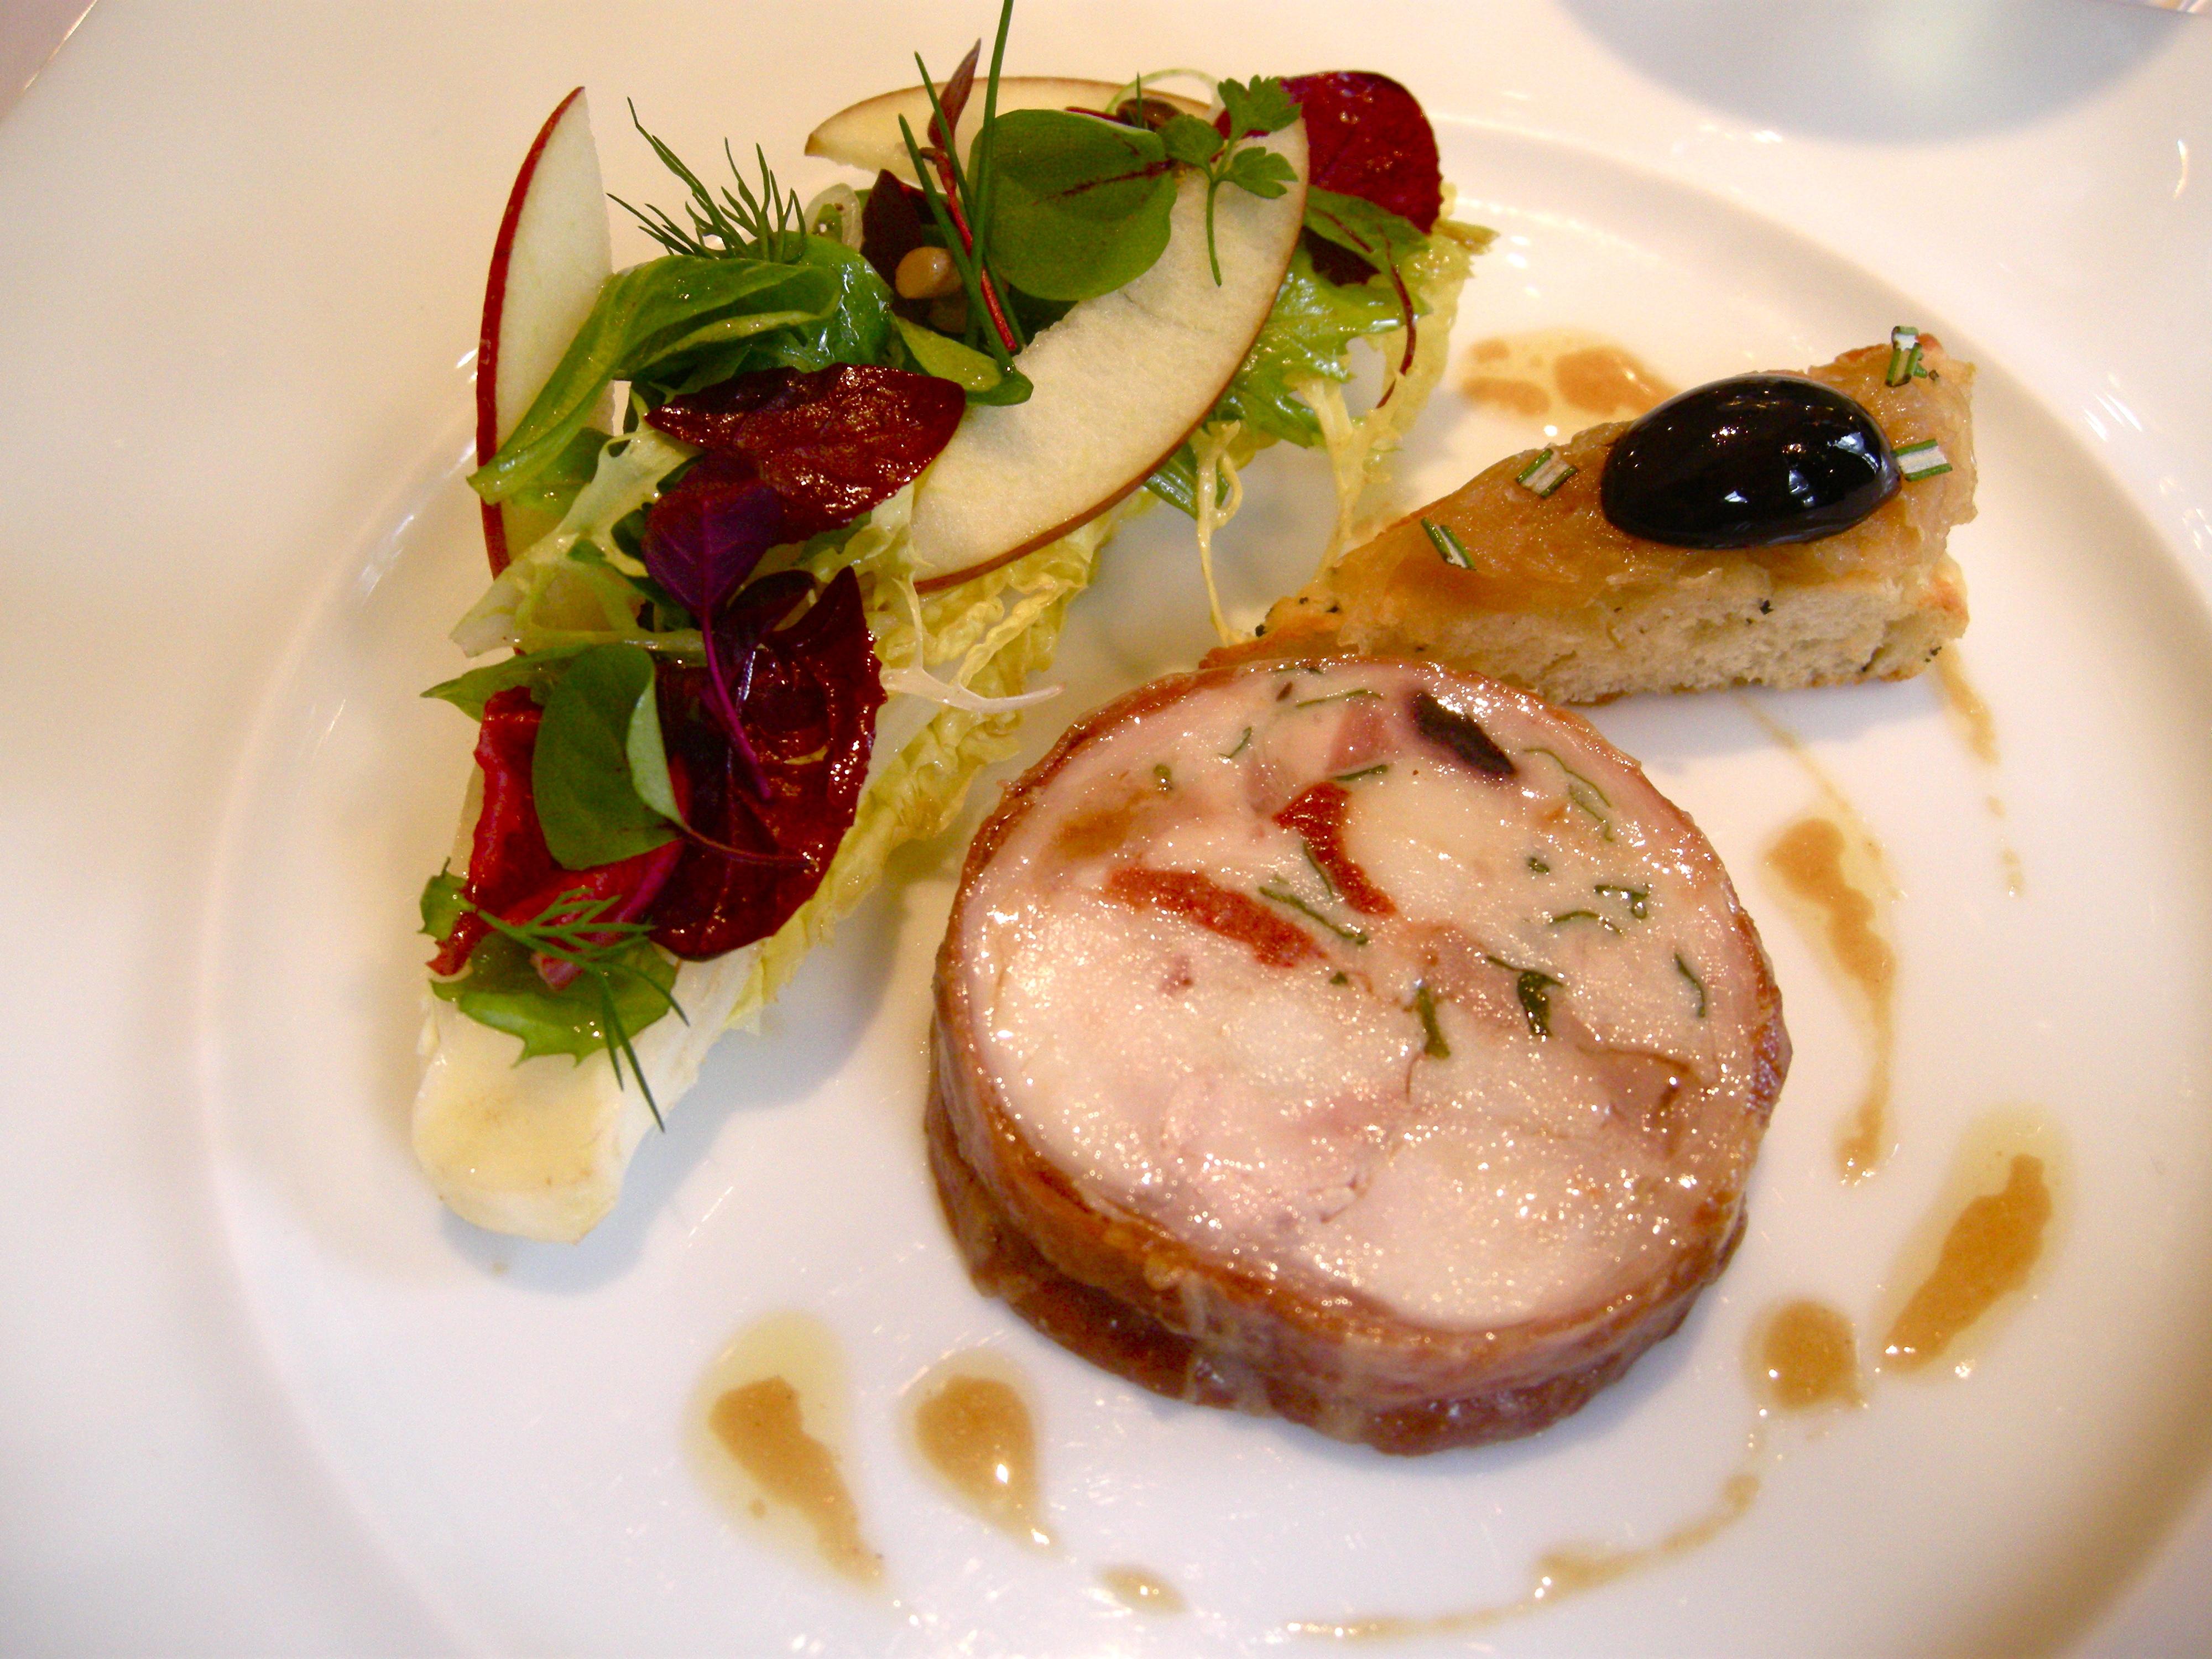 Gordon ramsay felixhirsch 39 s tour de table - Gordon ramsay cuisine cool ...